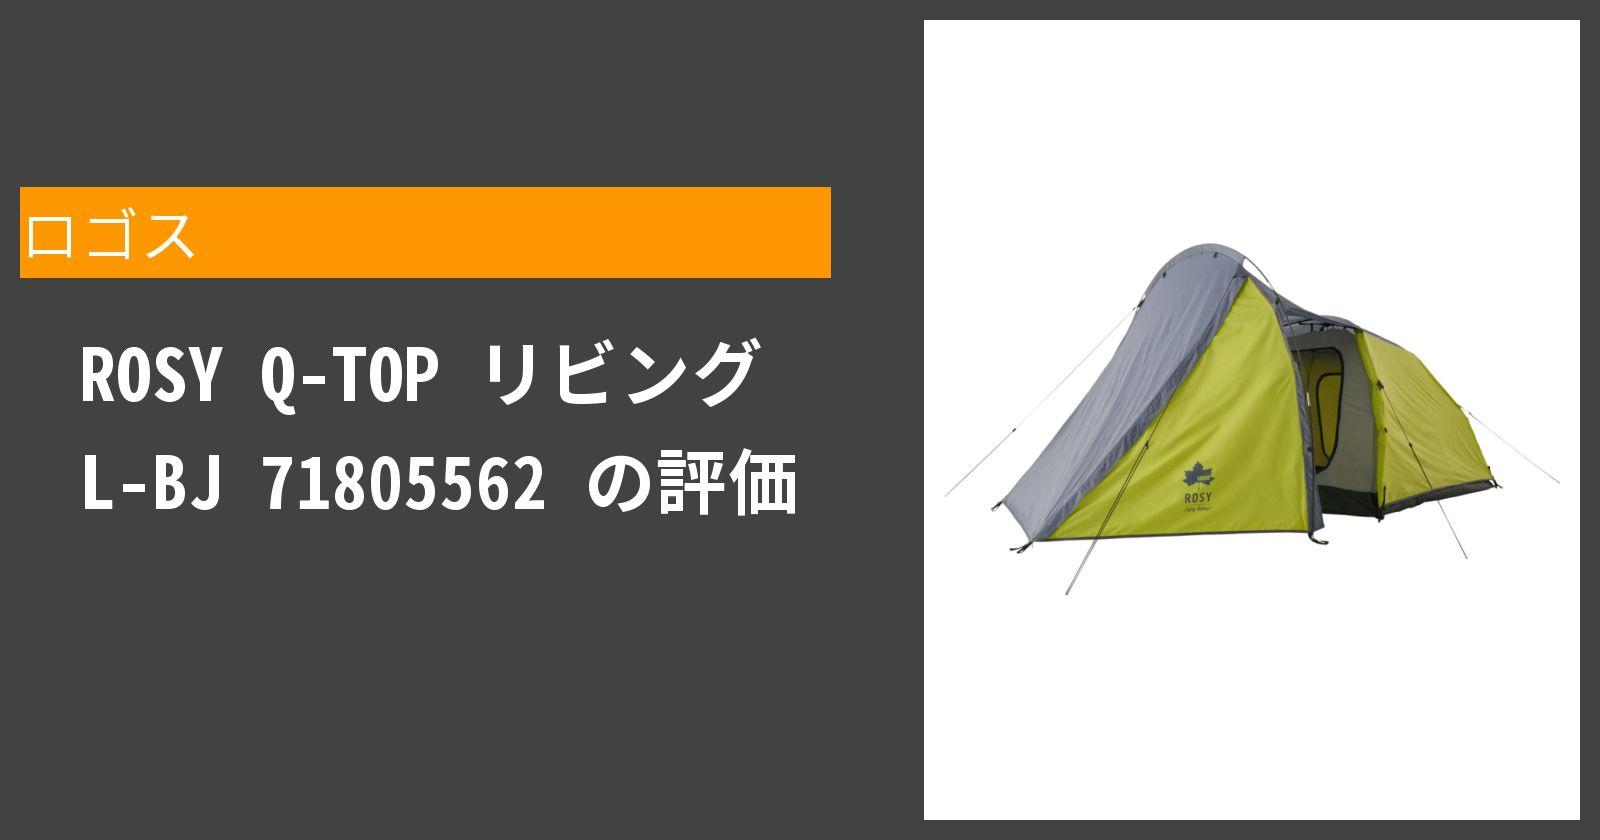 ROSY Q-TOP リビング L-BJ 71805562を徹底評価